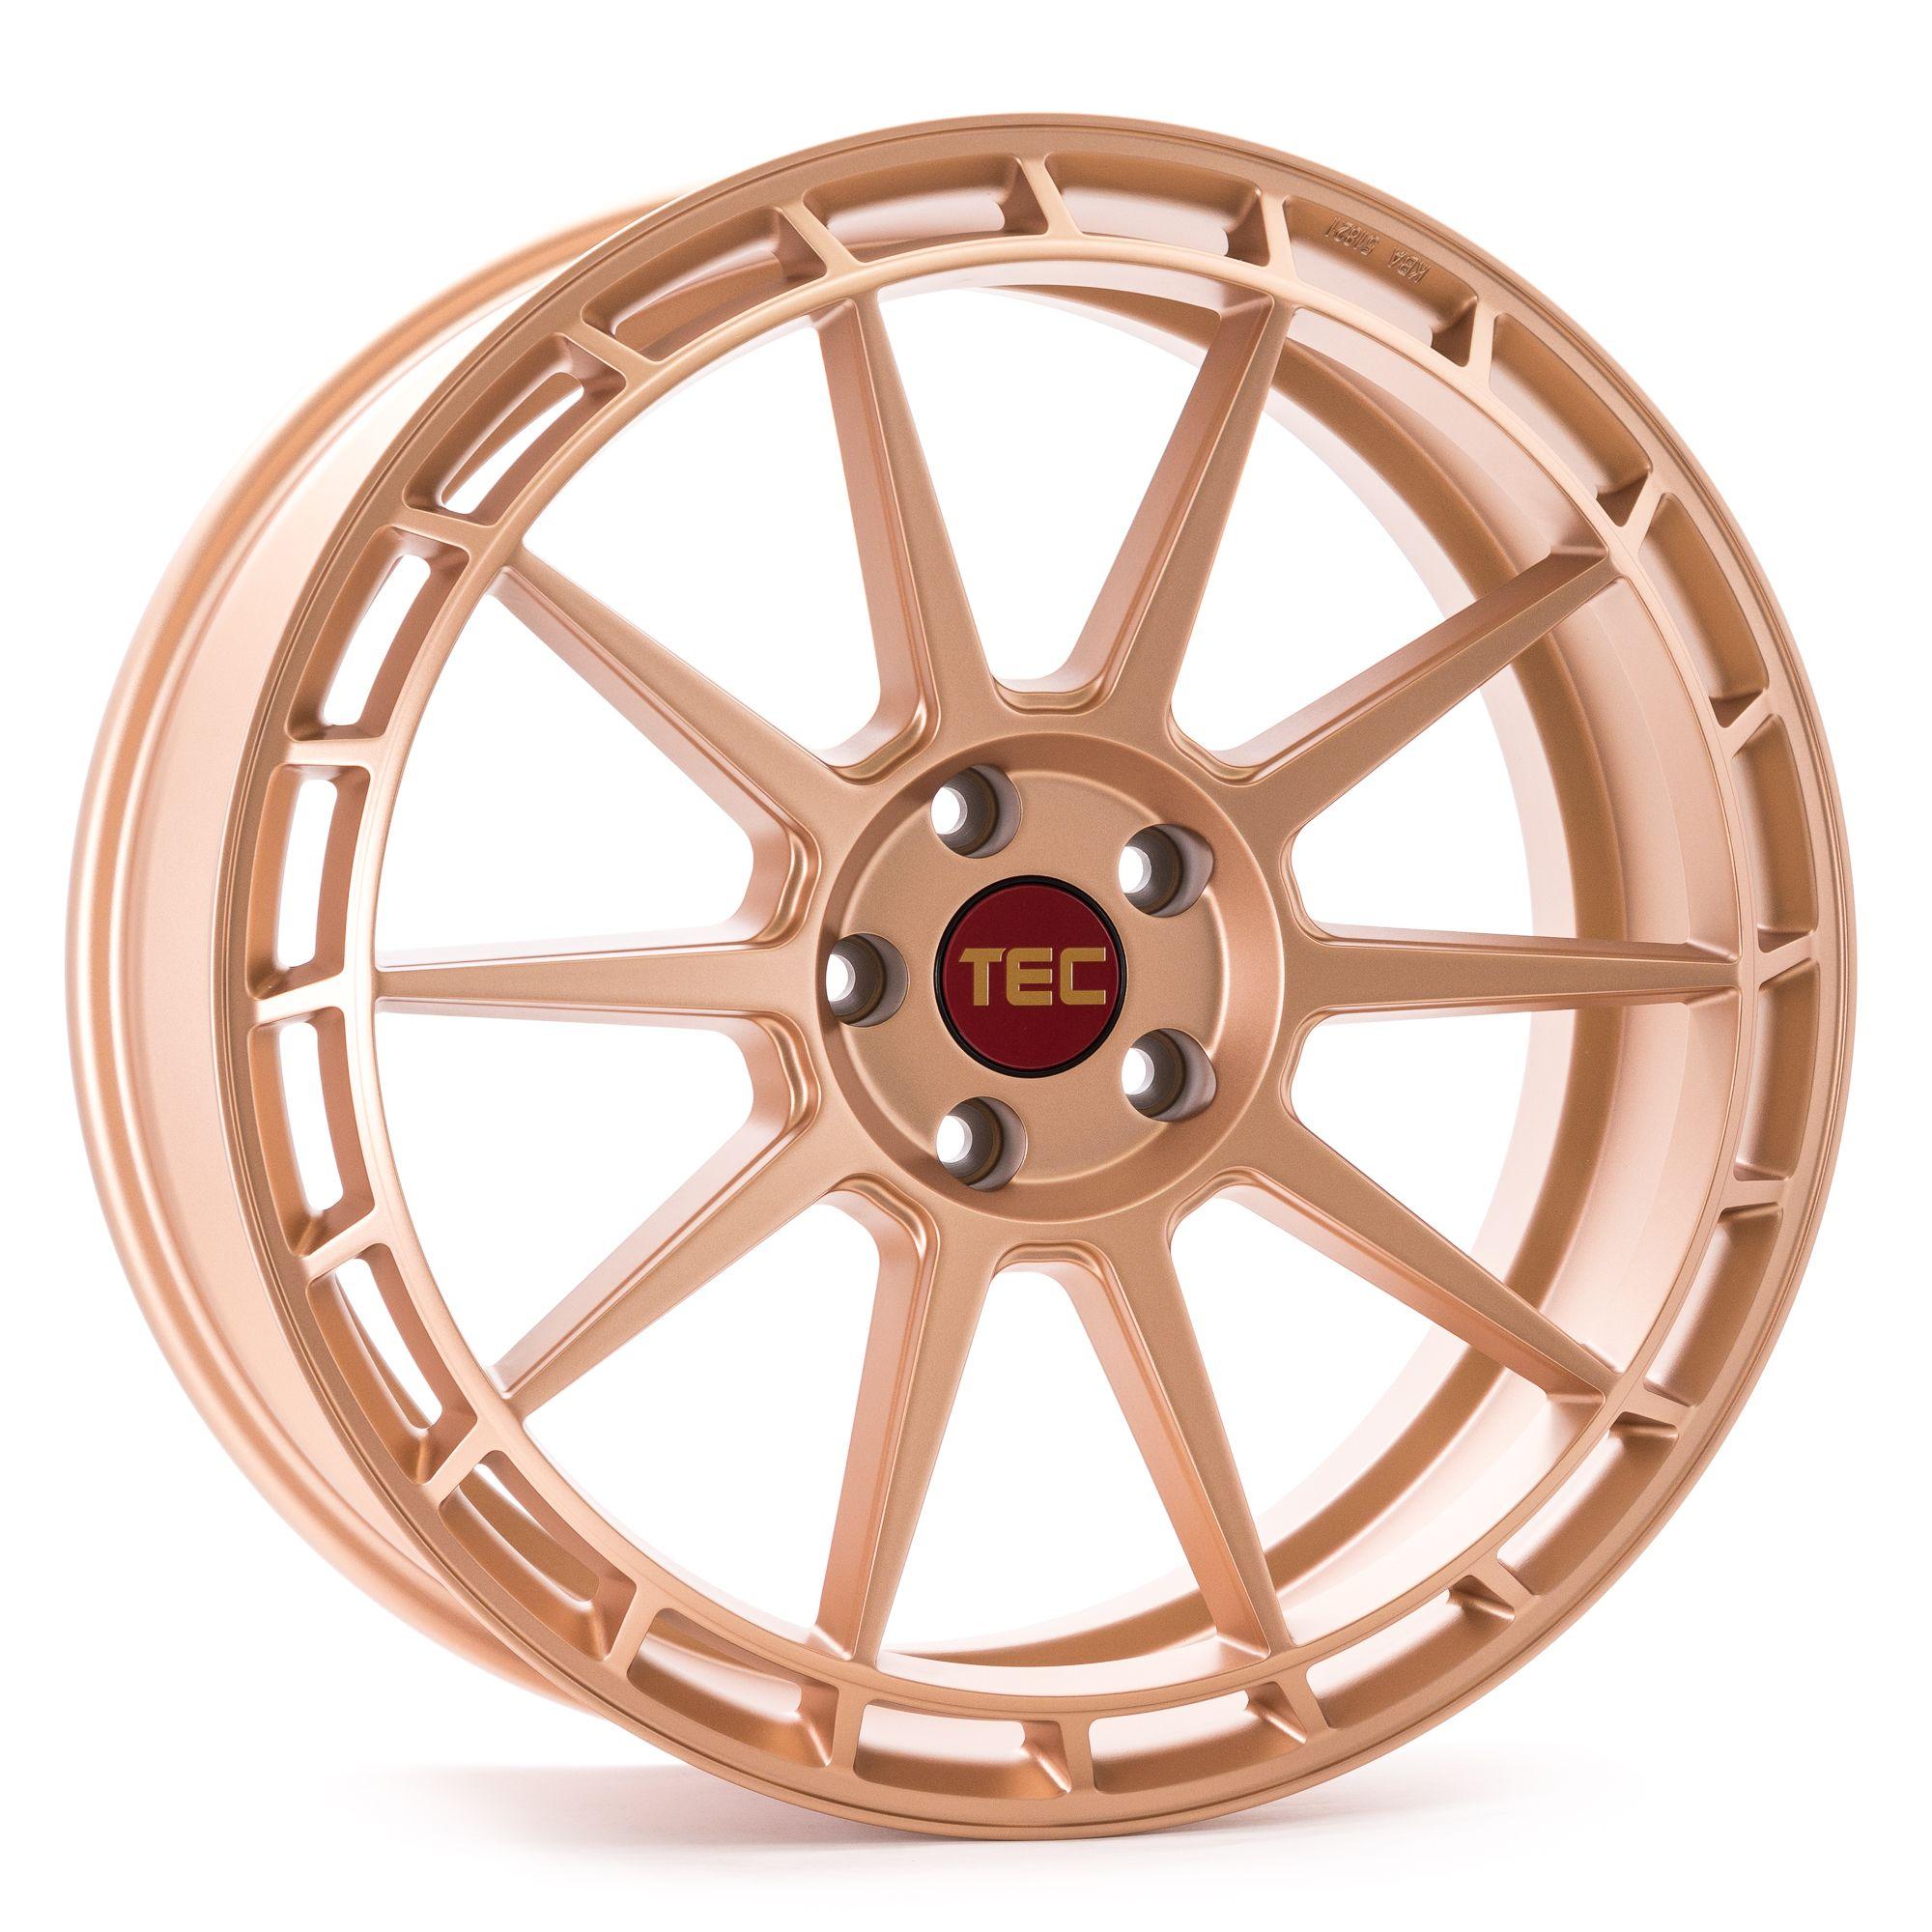 tec speedwheels gt8 felgen ros gold in 20 zoll. Black Bedroom Furniture Sets. Home Design Ideas